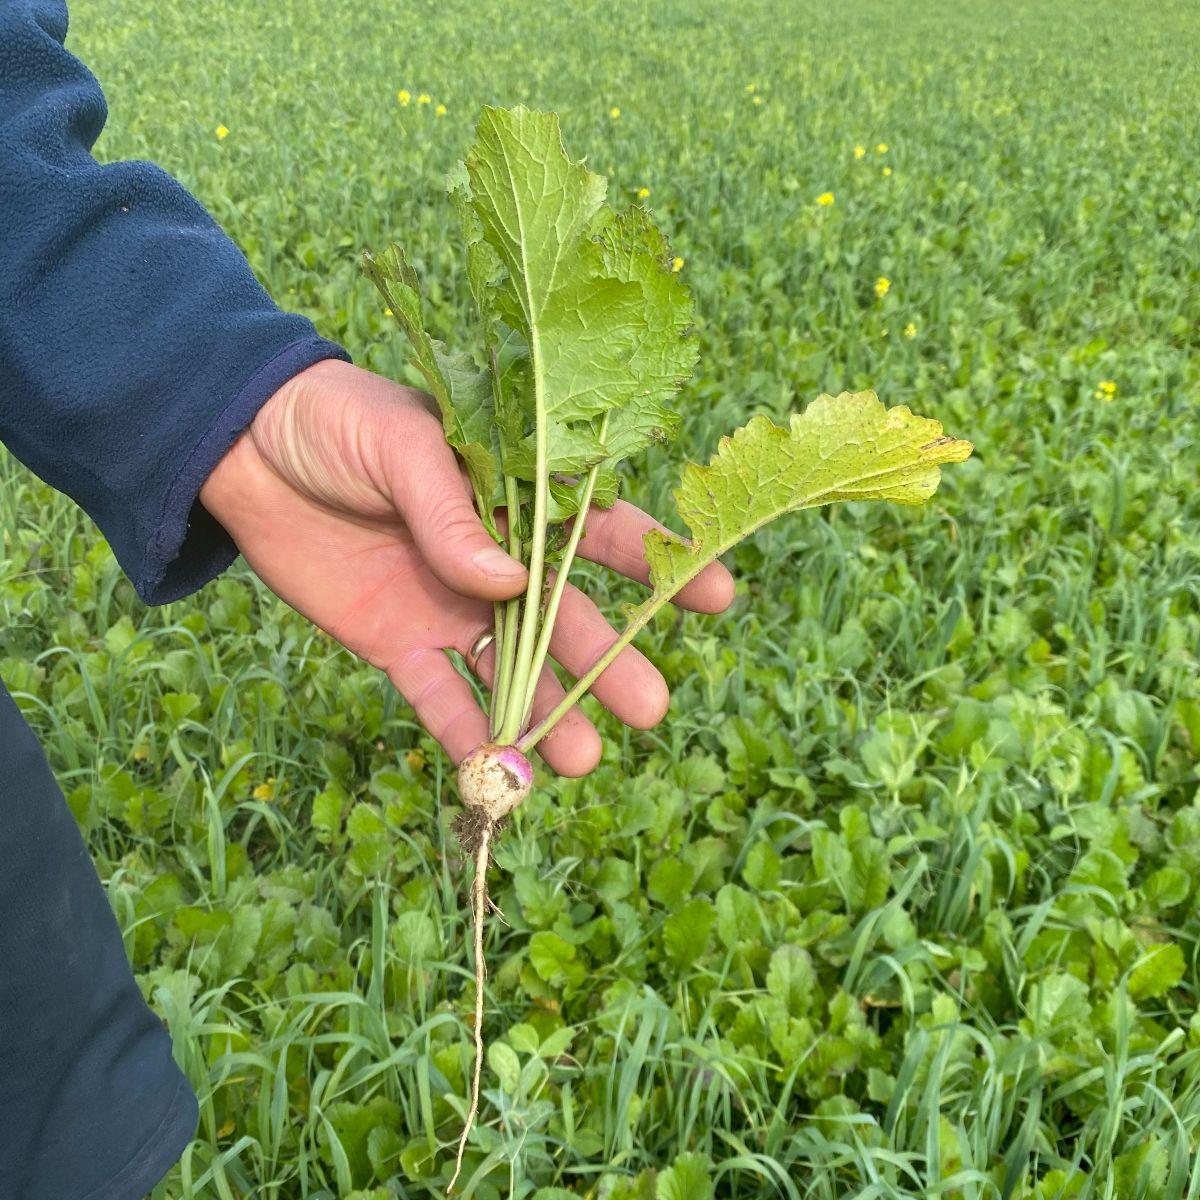 hand holding forage turnip